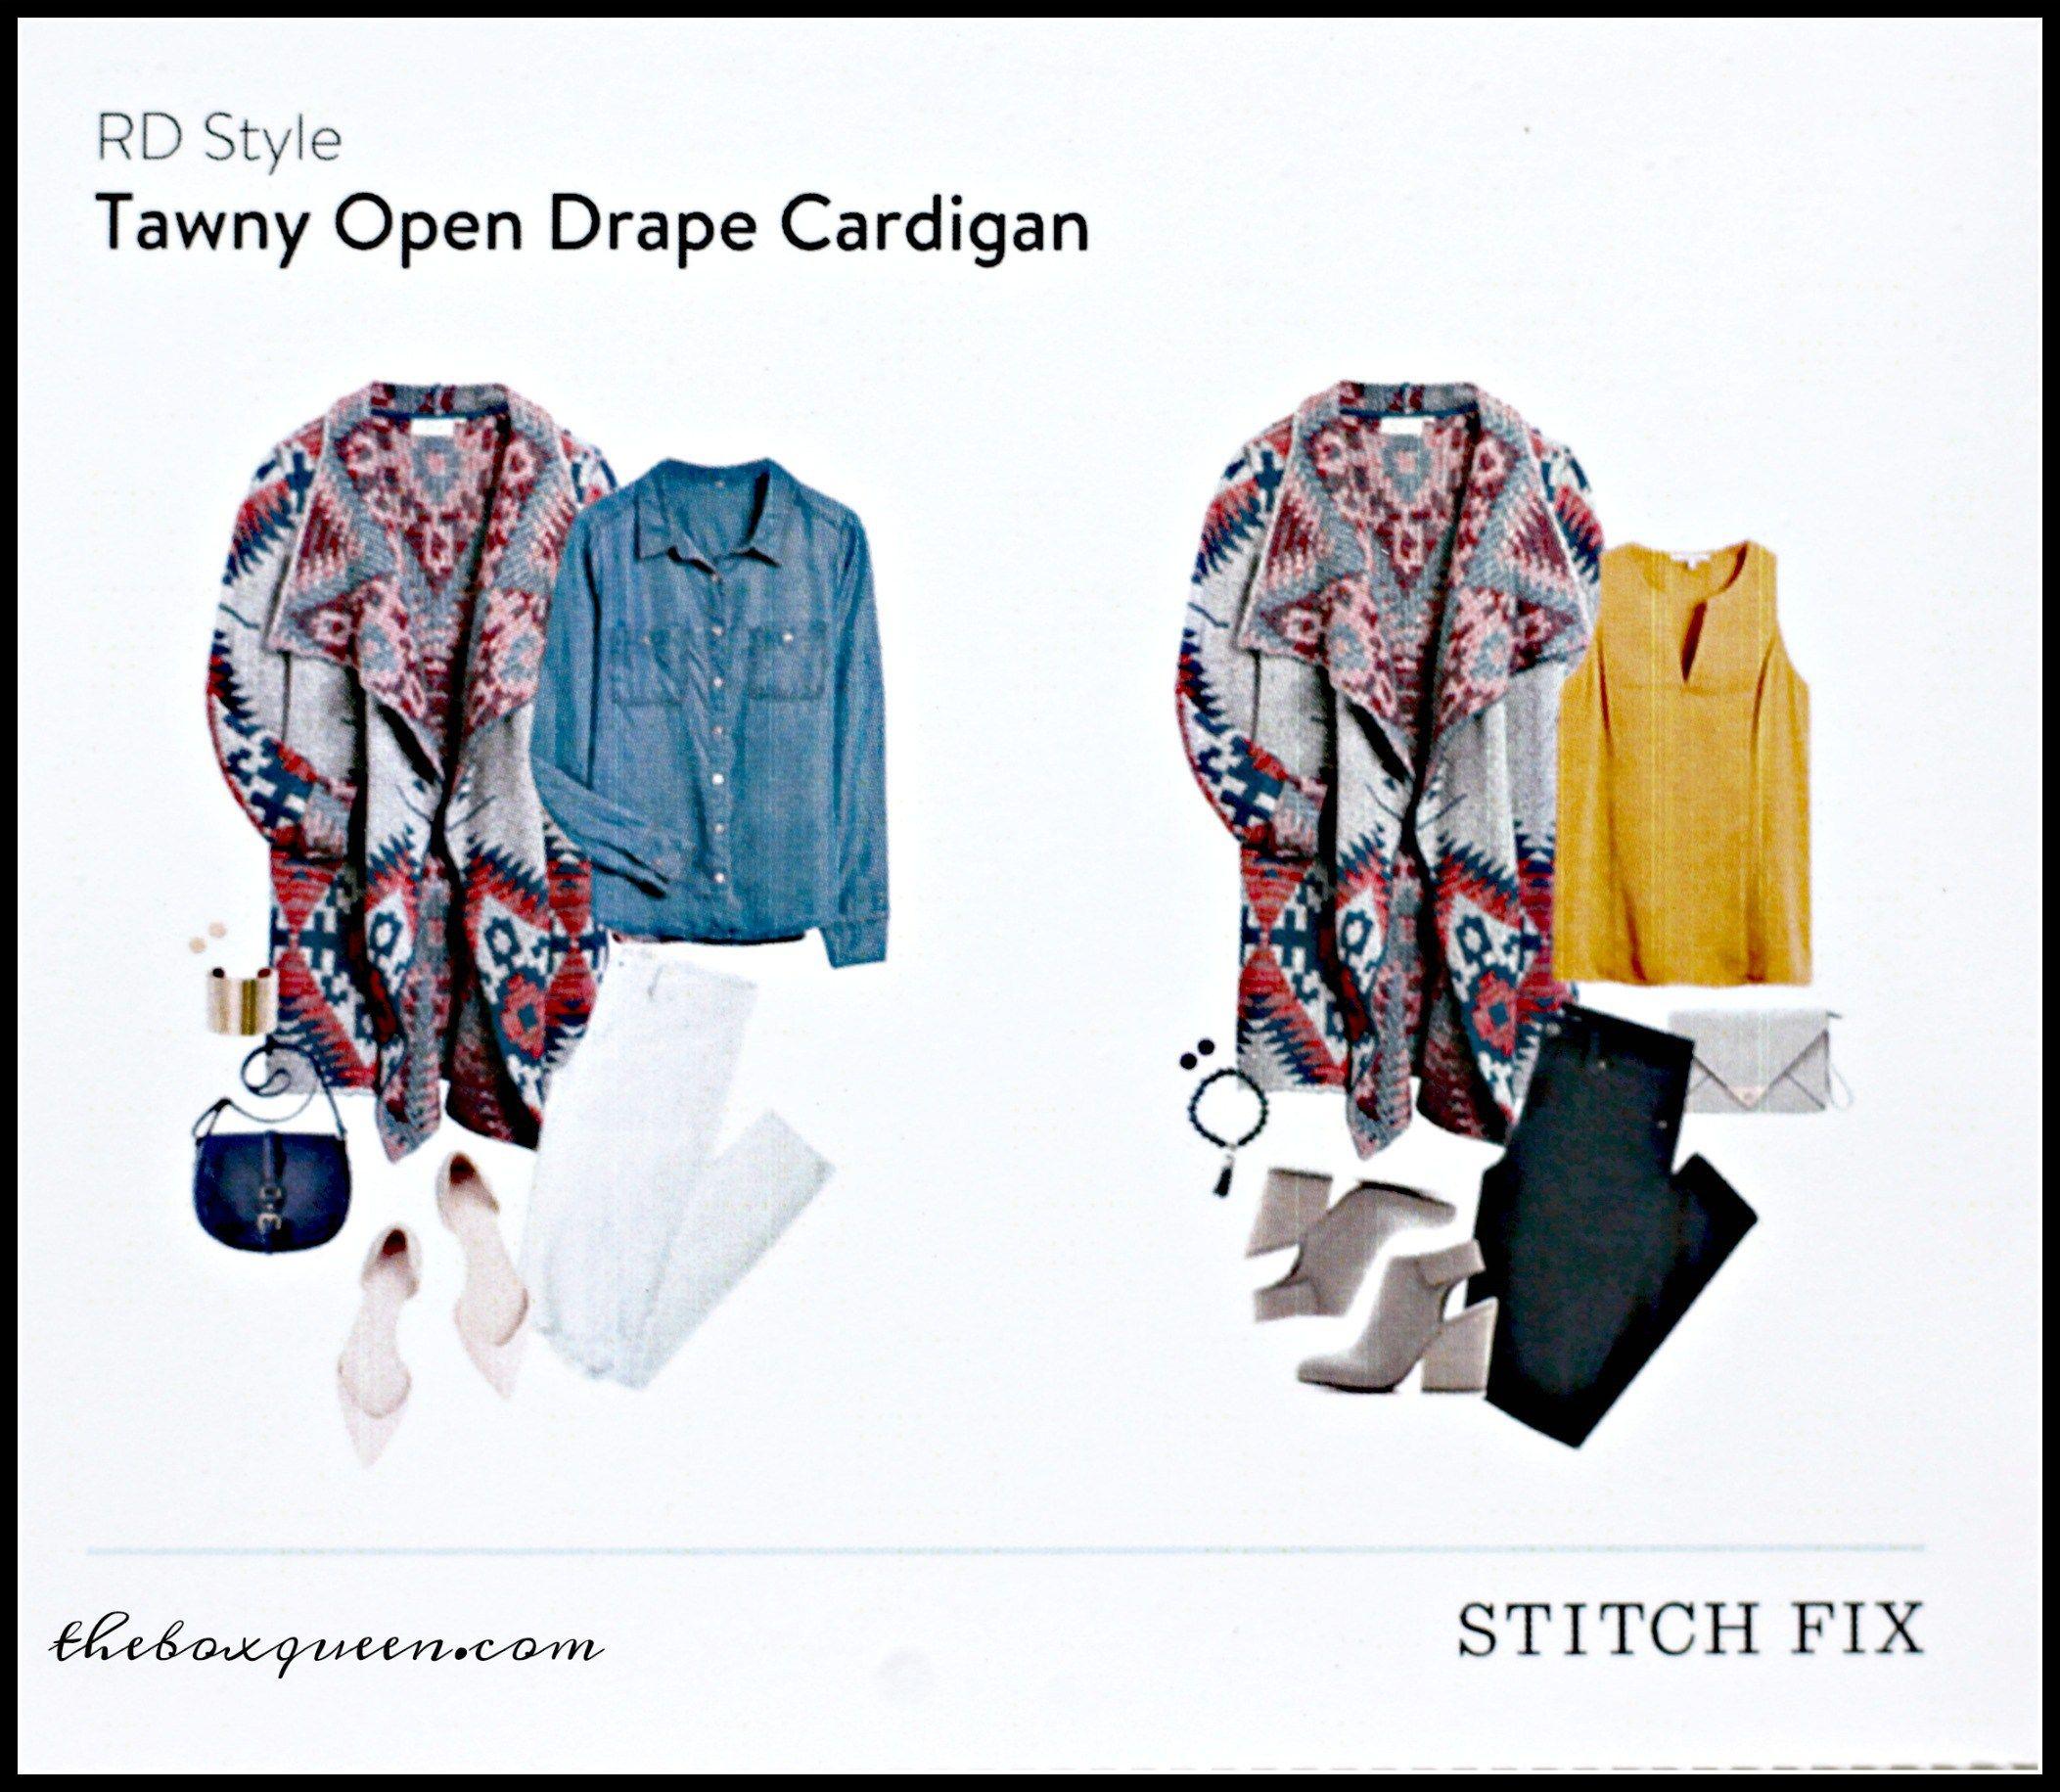 RD Style Tawny Open Drape Cardigan